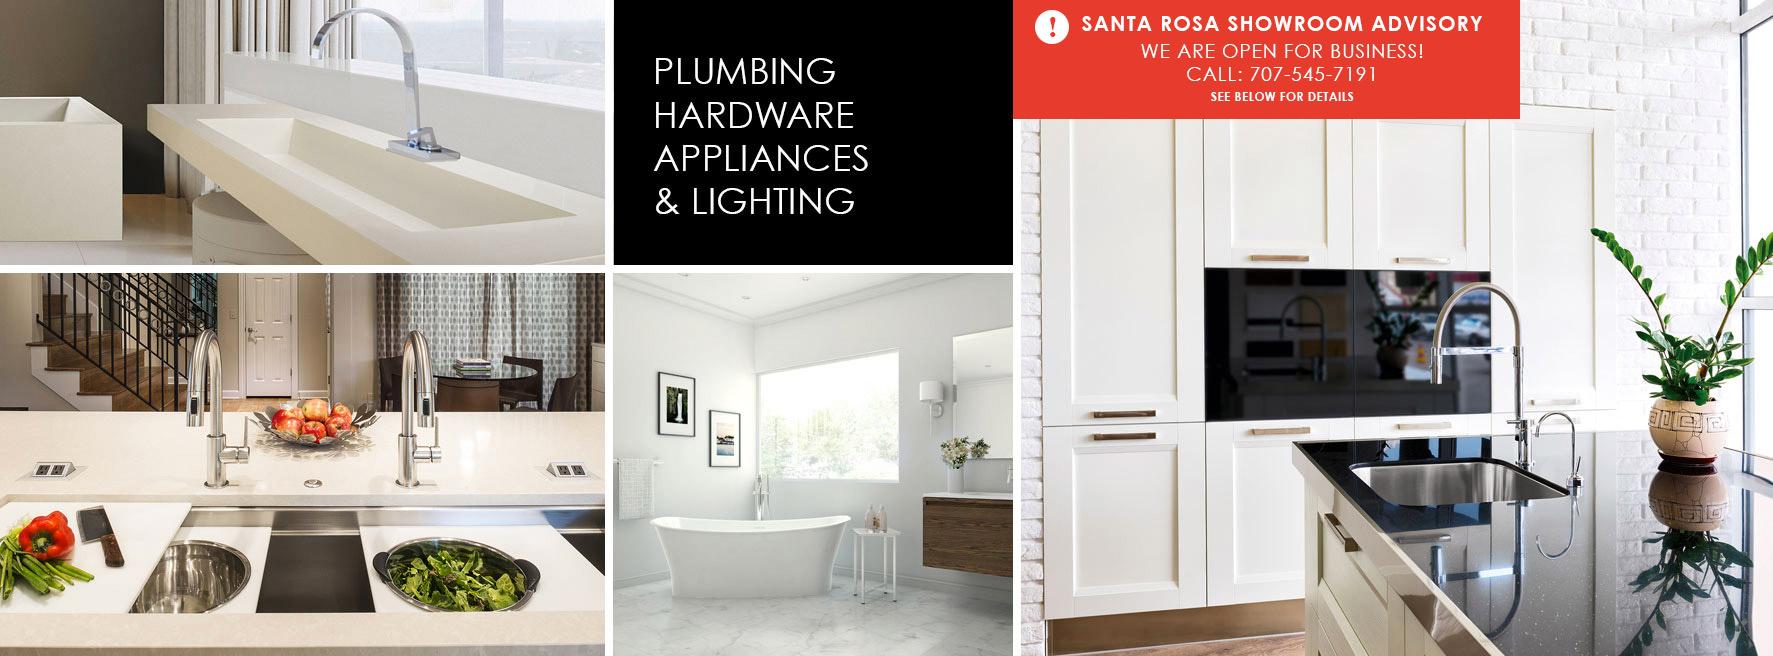 Home PagepbkAdmin2018-01-02T095721+0000 & Premier Bath and Kitchen u2013 Featuring decorative plumbing fixtures ... azcodes.com